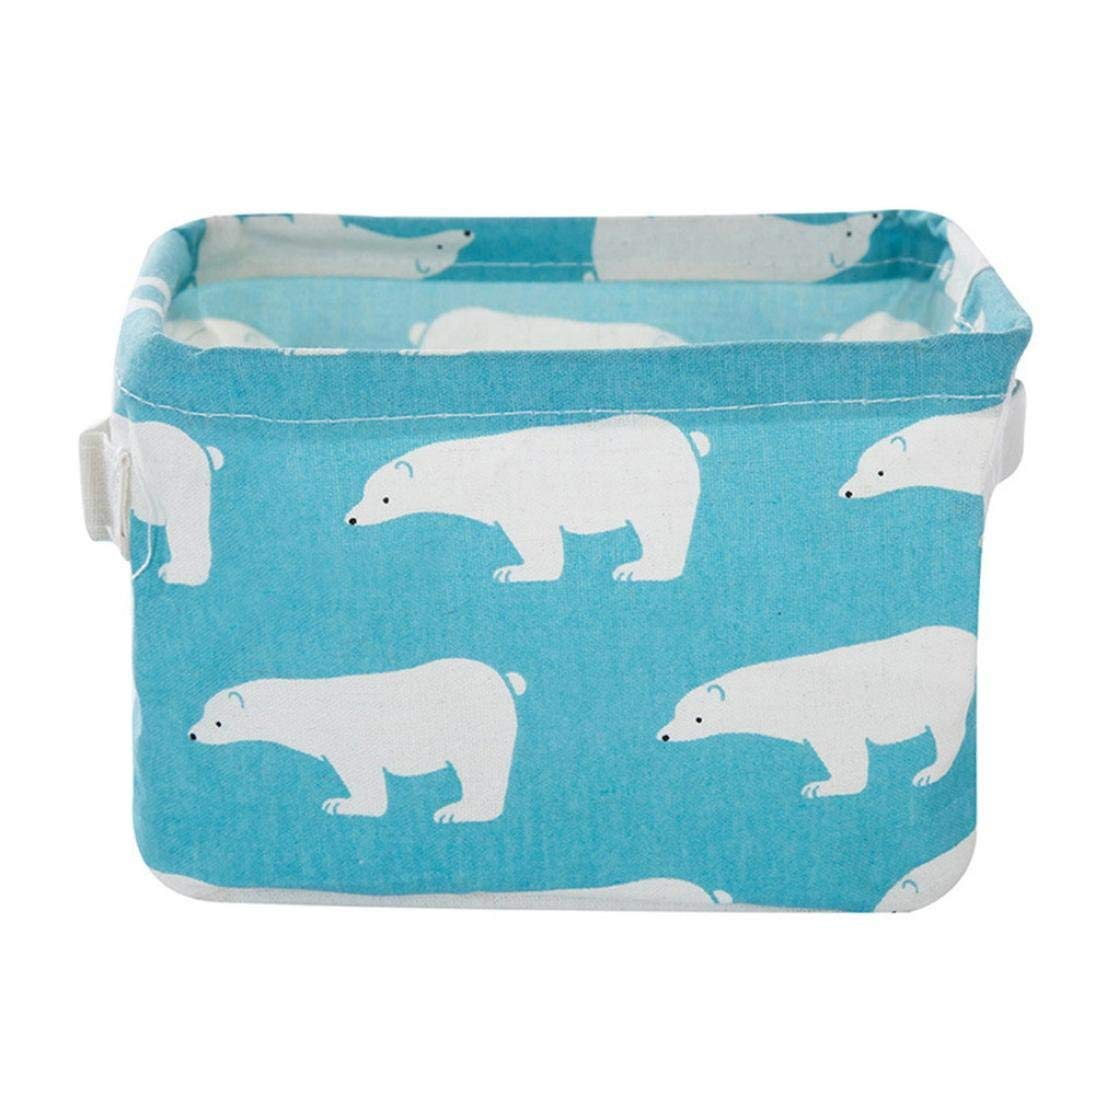 Storage Basket, Yezijin Foldable 6 Colors Storage Bin Closet Toy Box Container Organizer Fabric Basket (A)